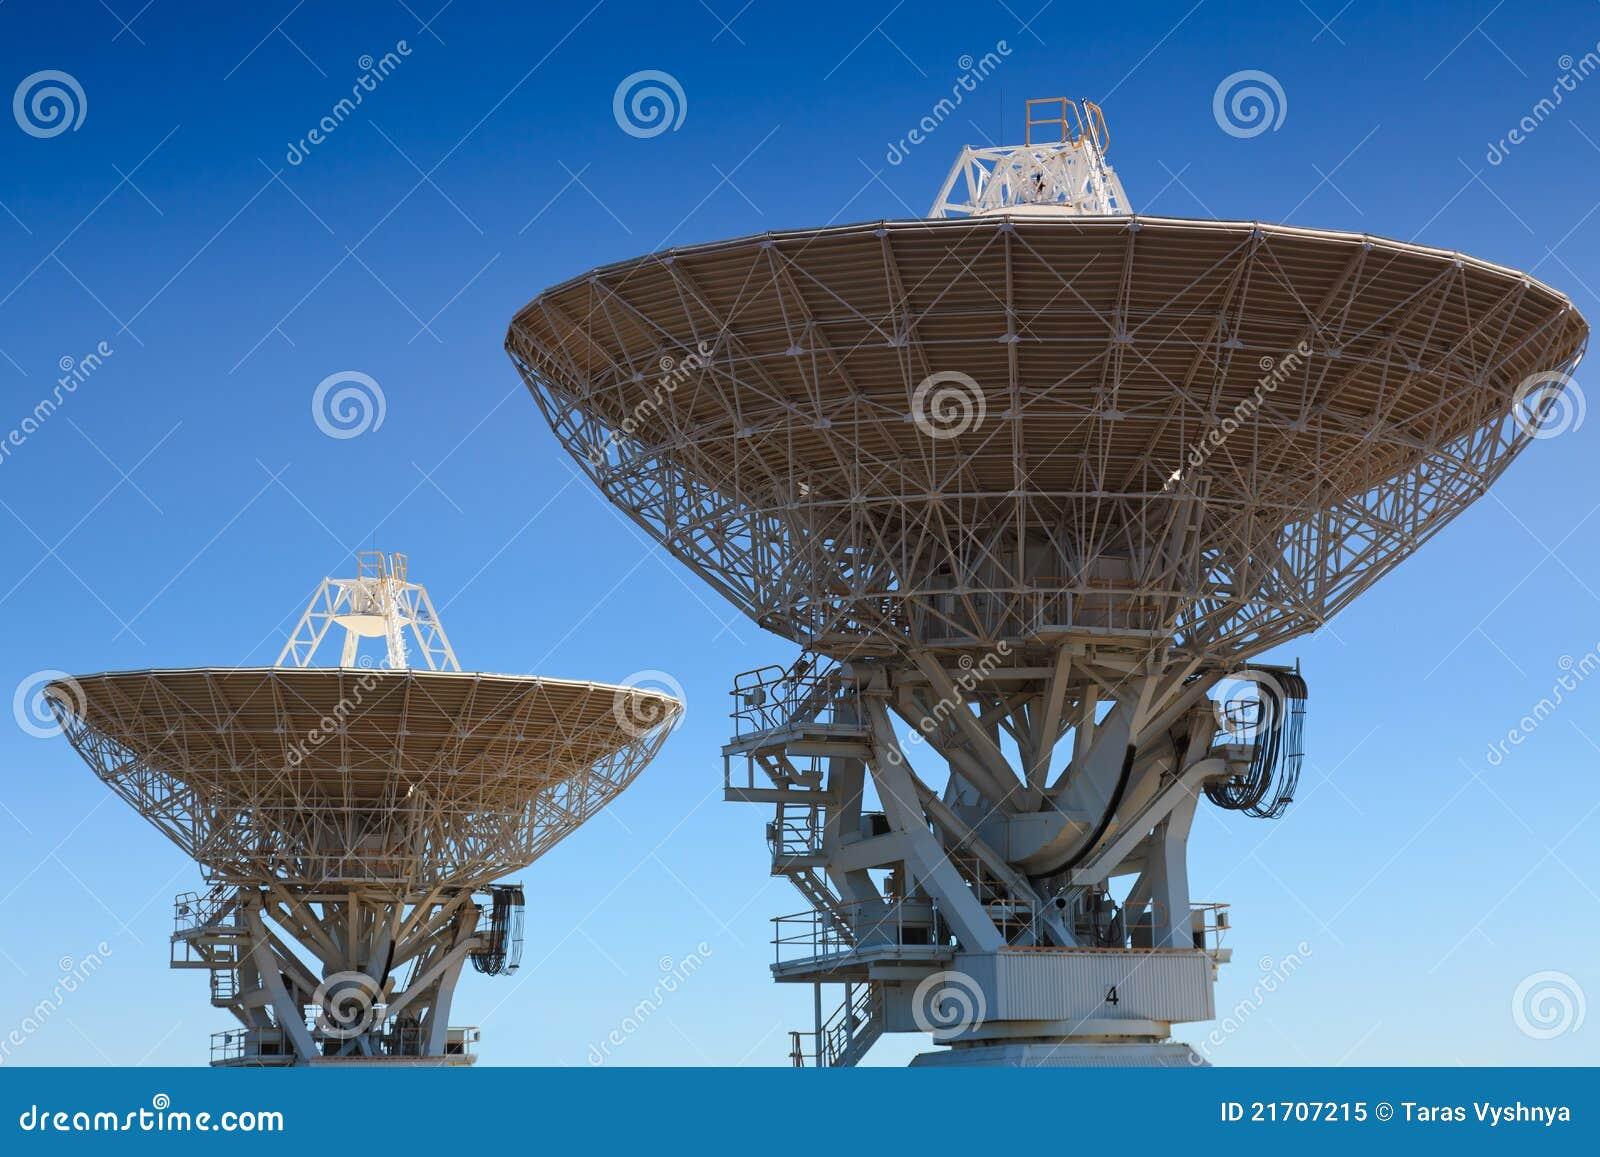 Astronomy 2 Antenna Royalty Free Stock Photo Image 21707215